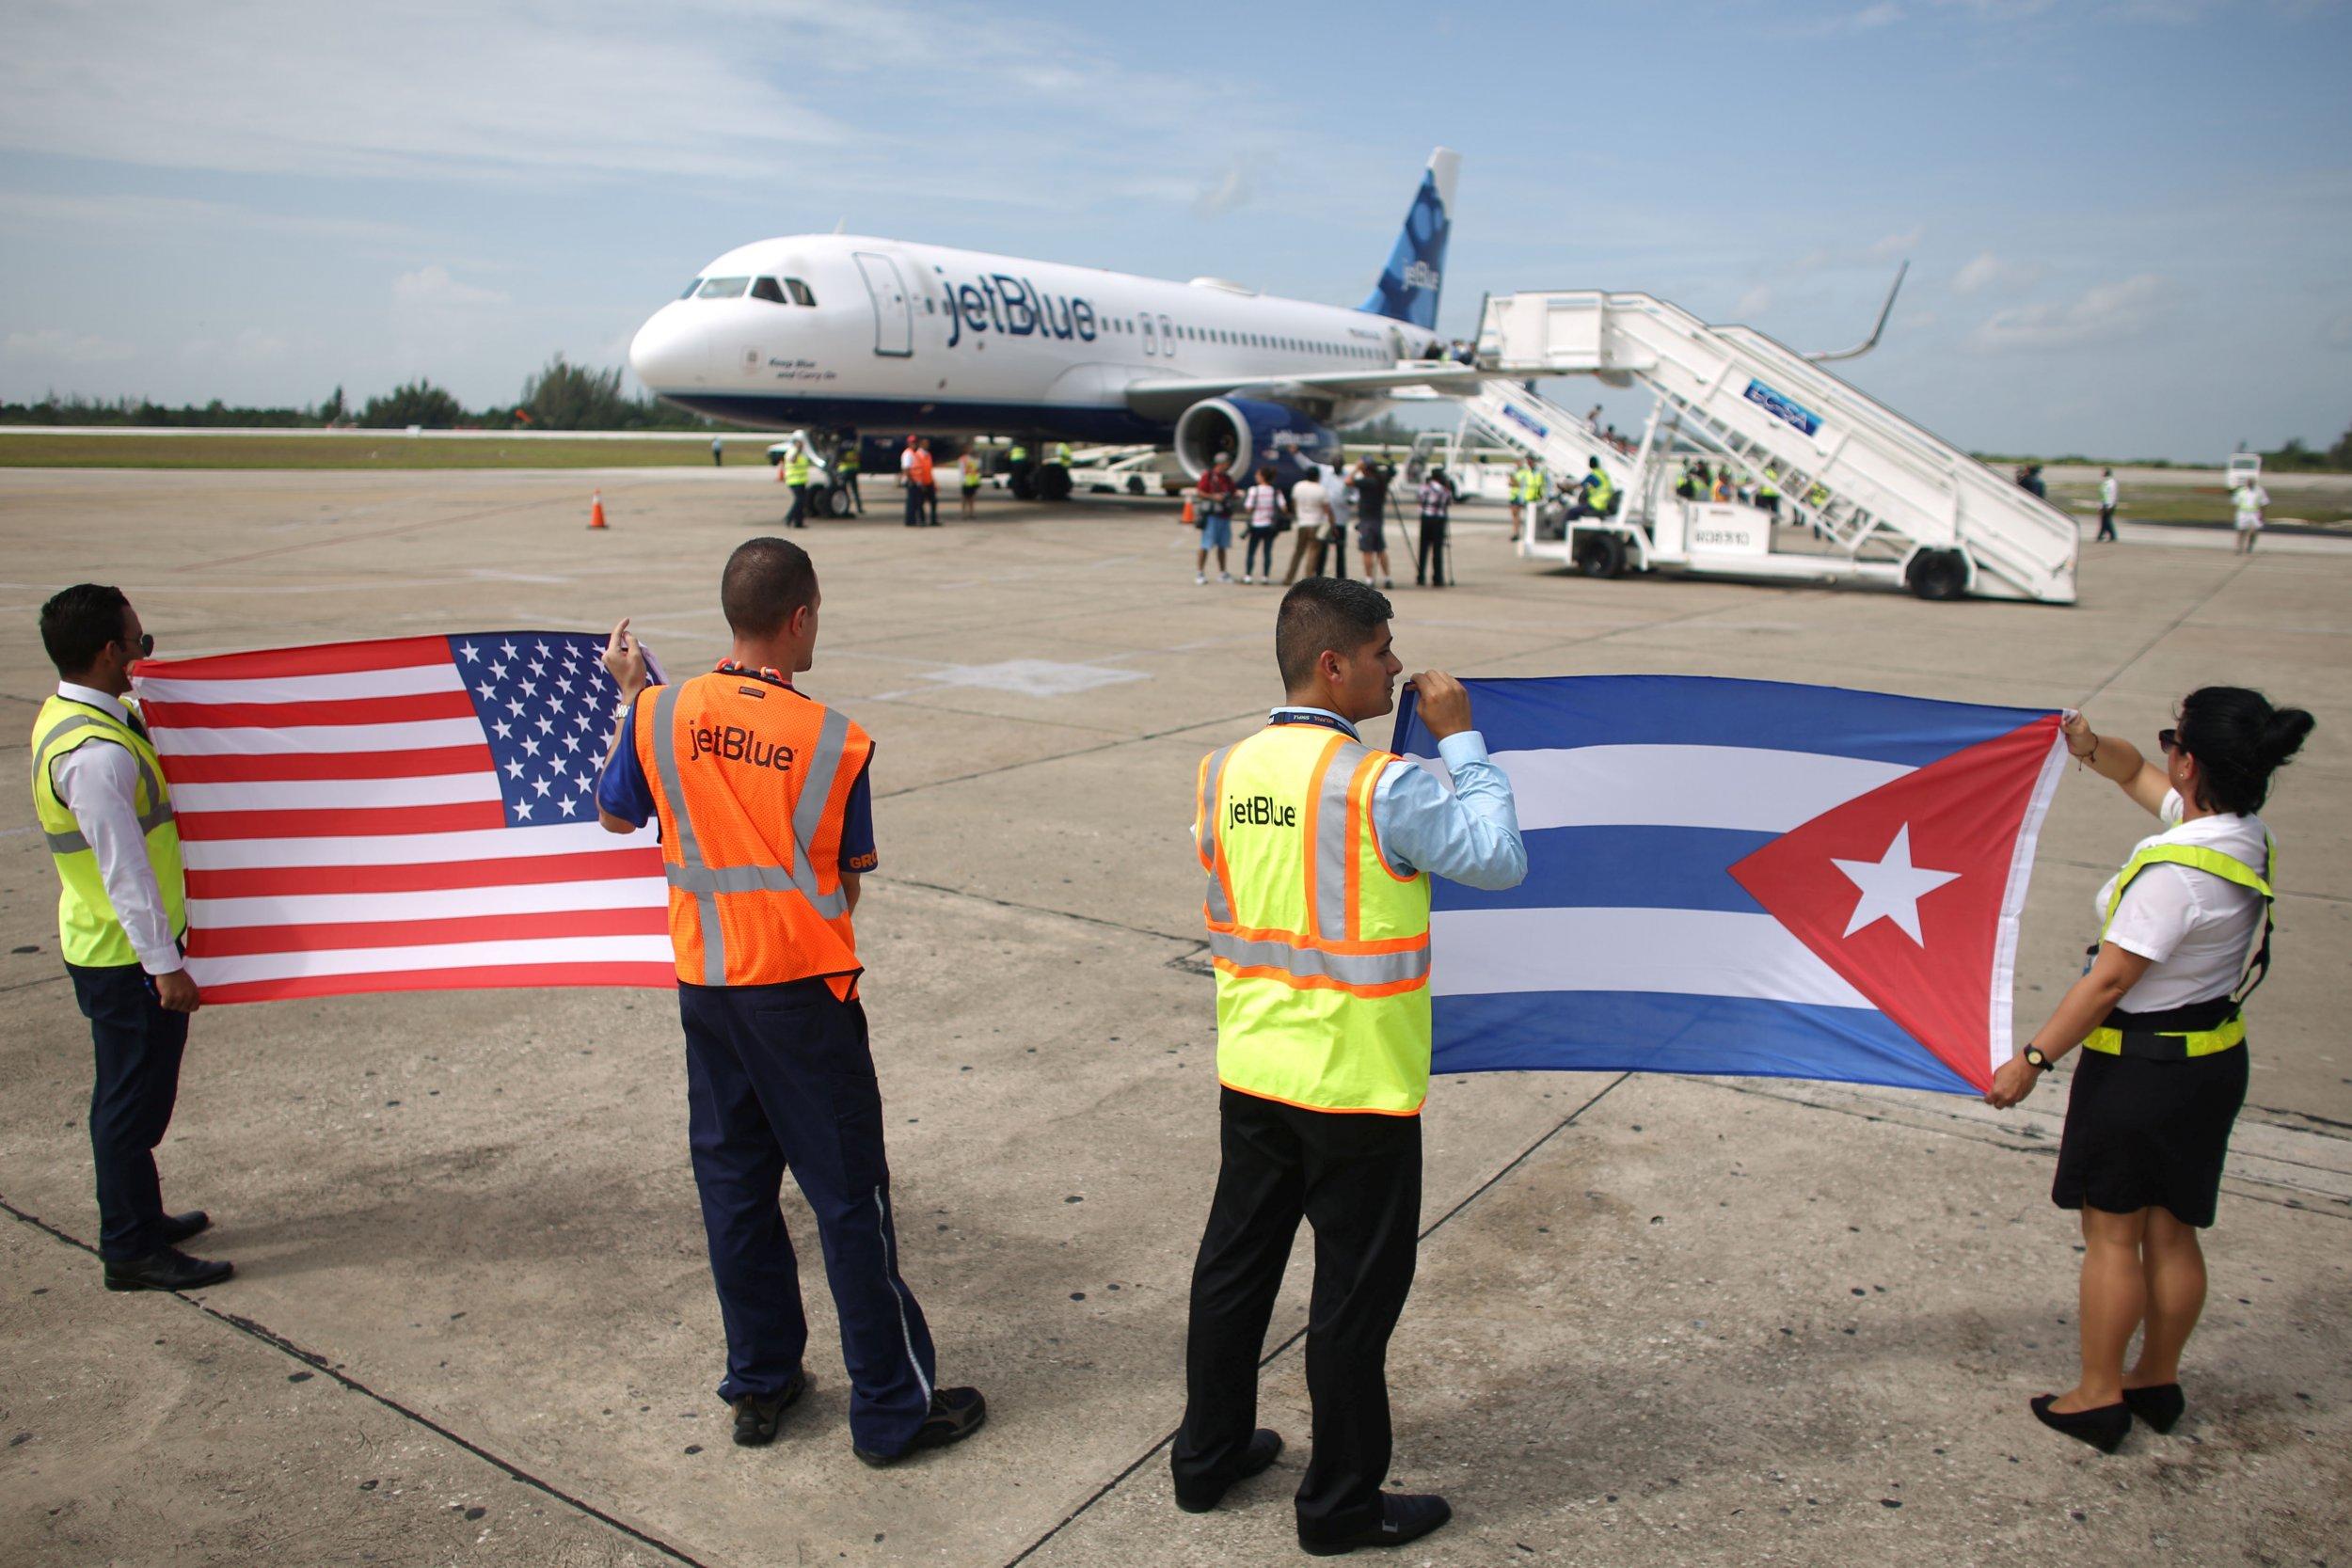 U.S. and Cuban flags